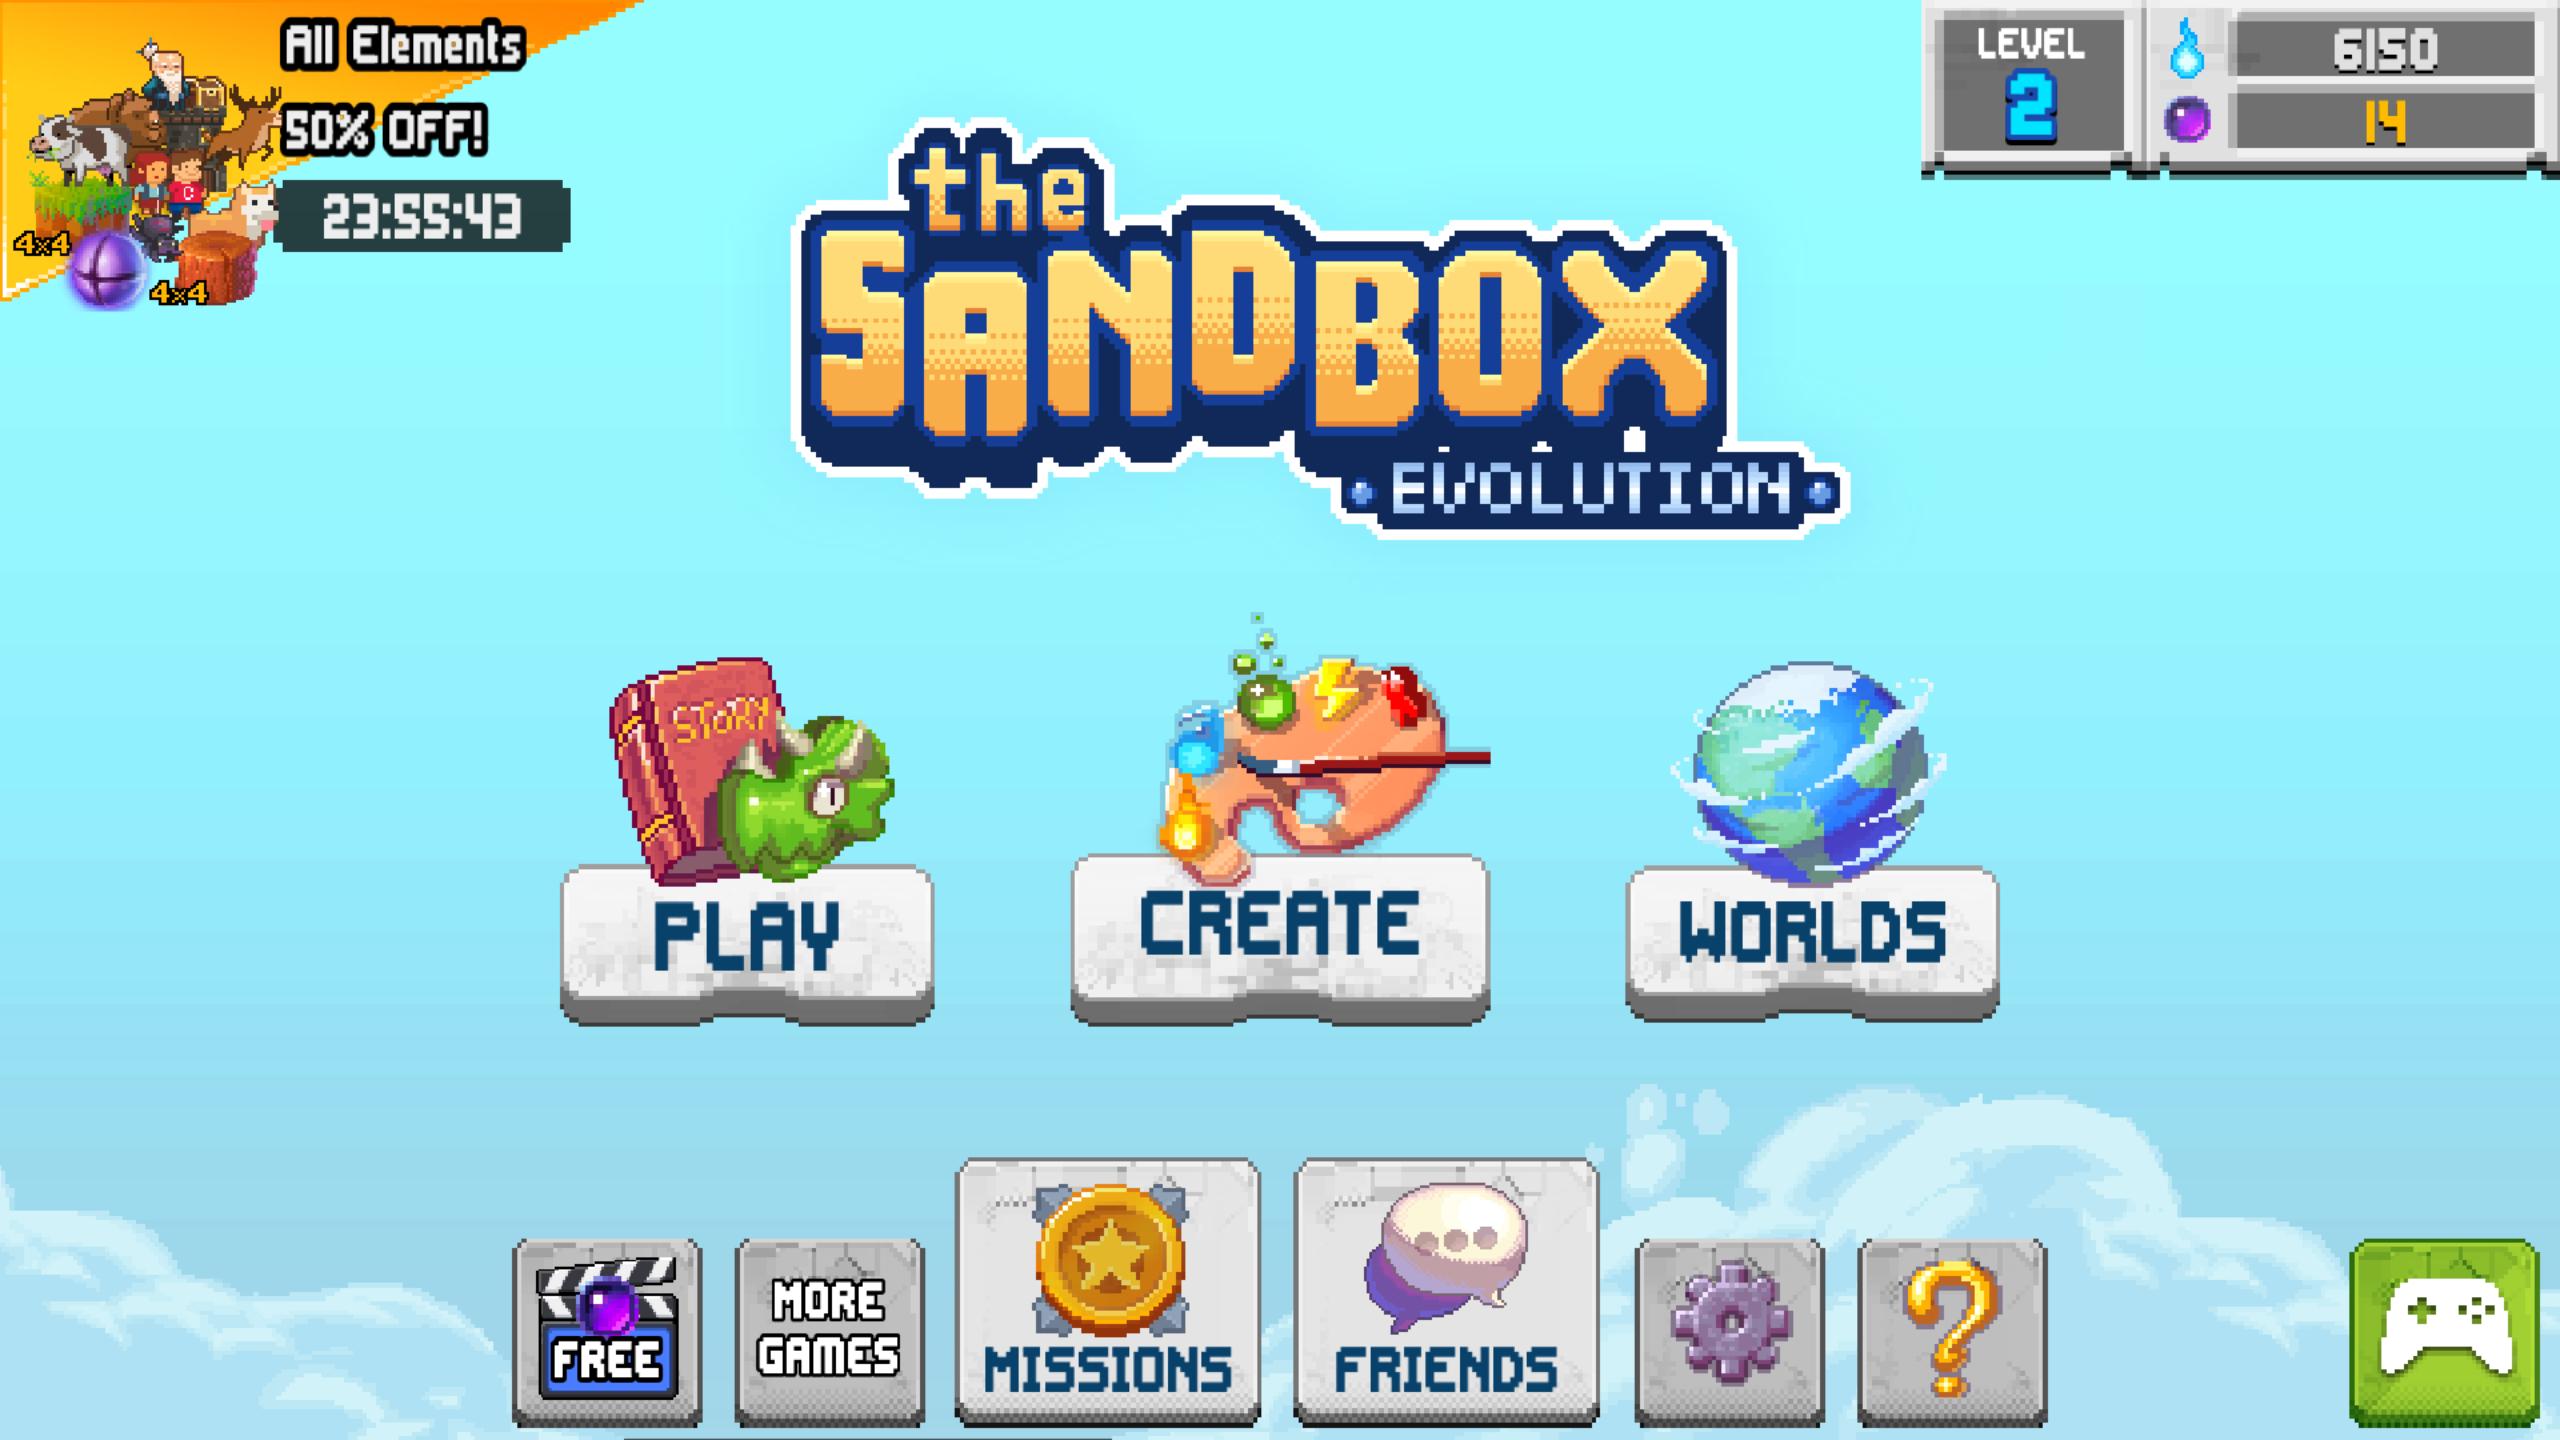 The Sandbox Evolution-5